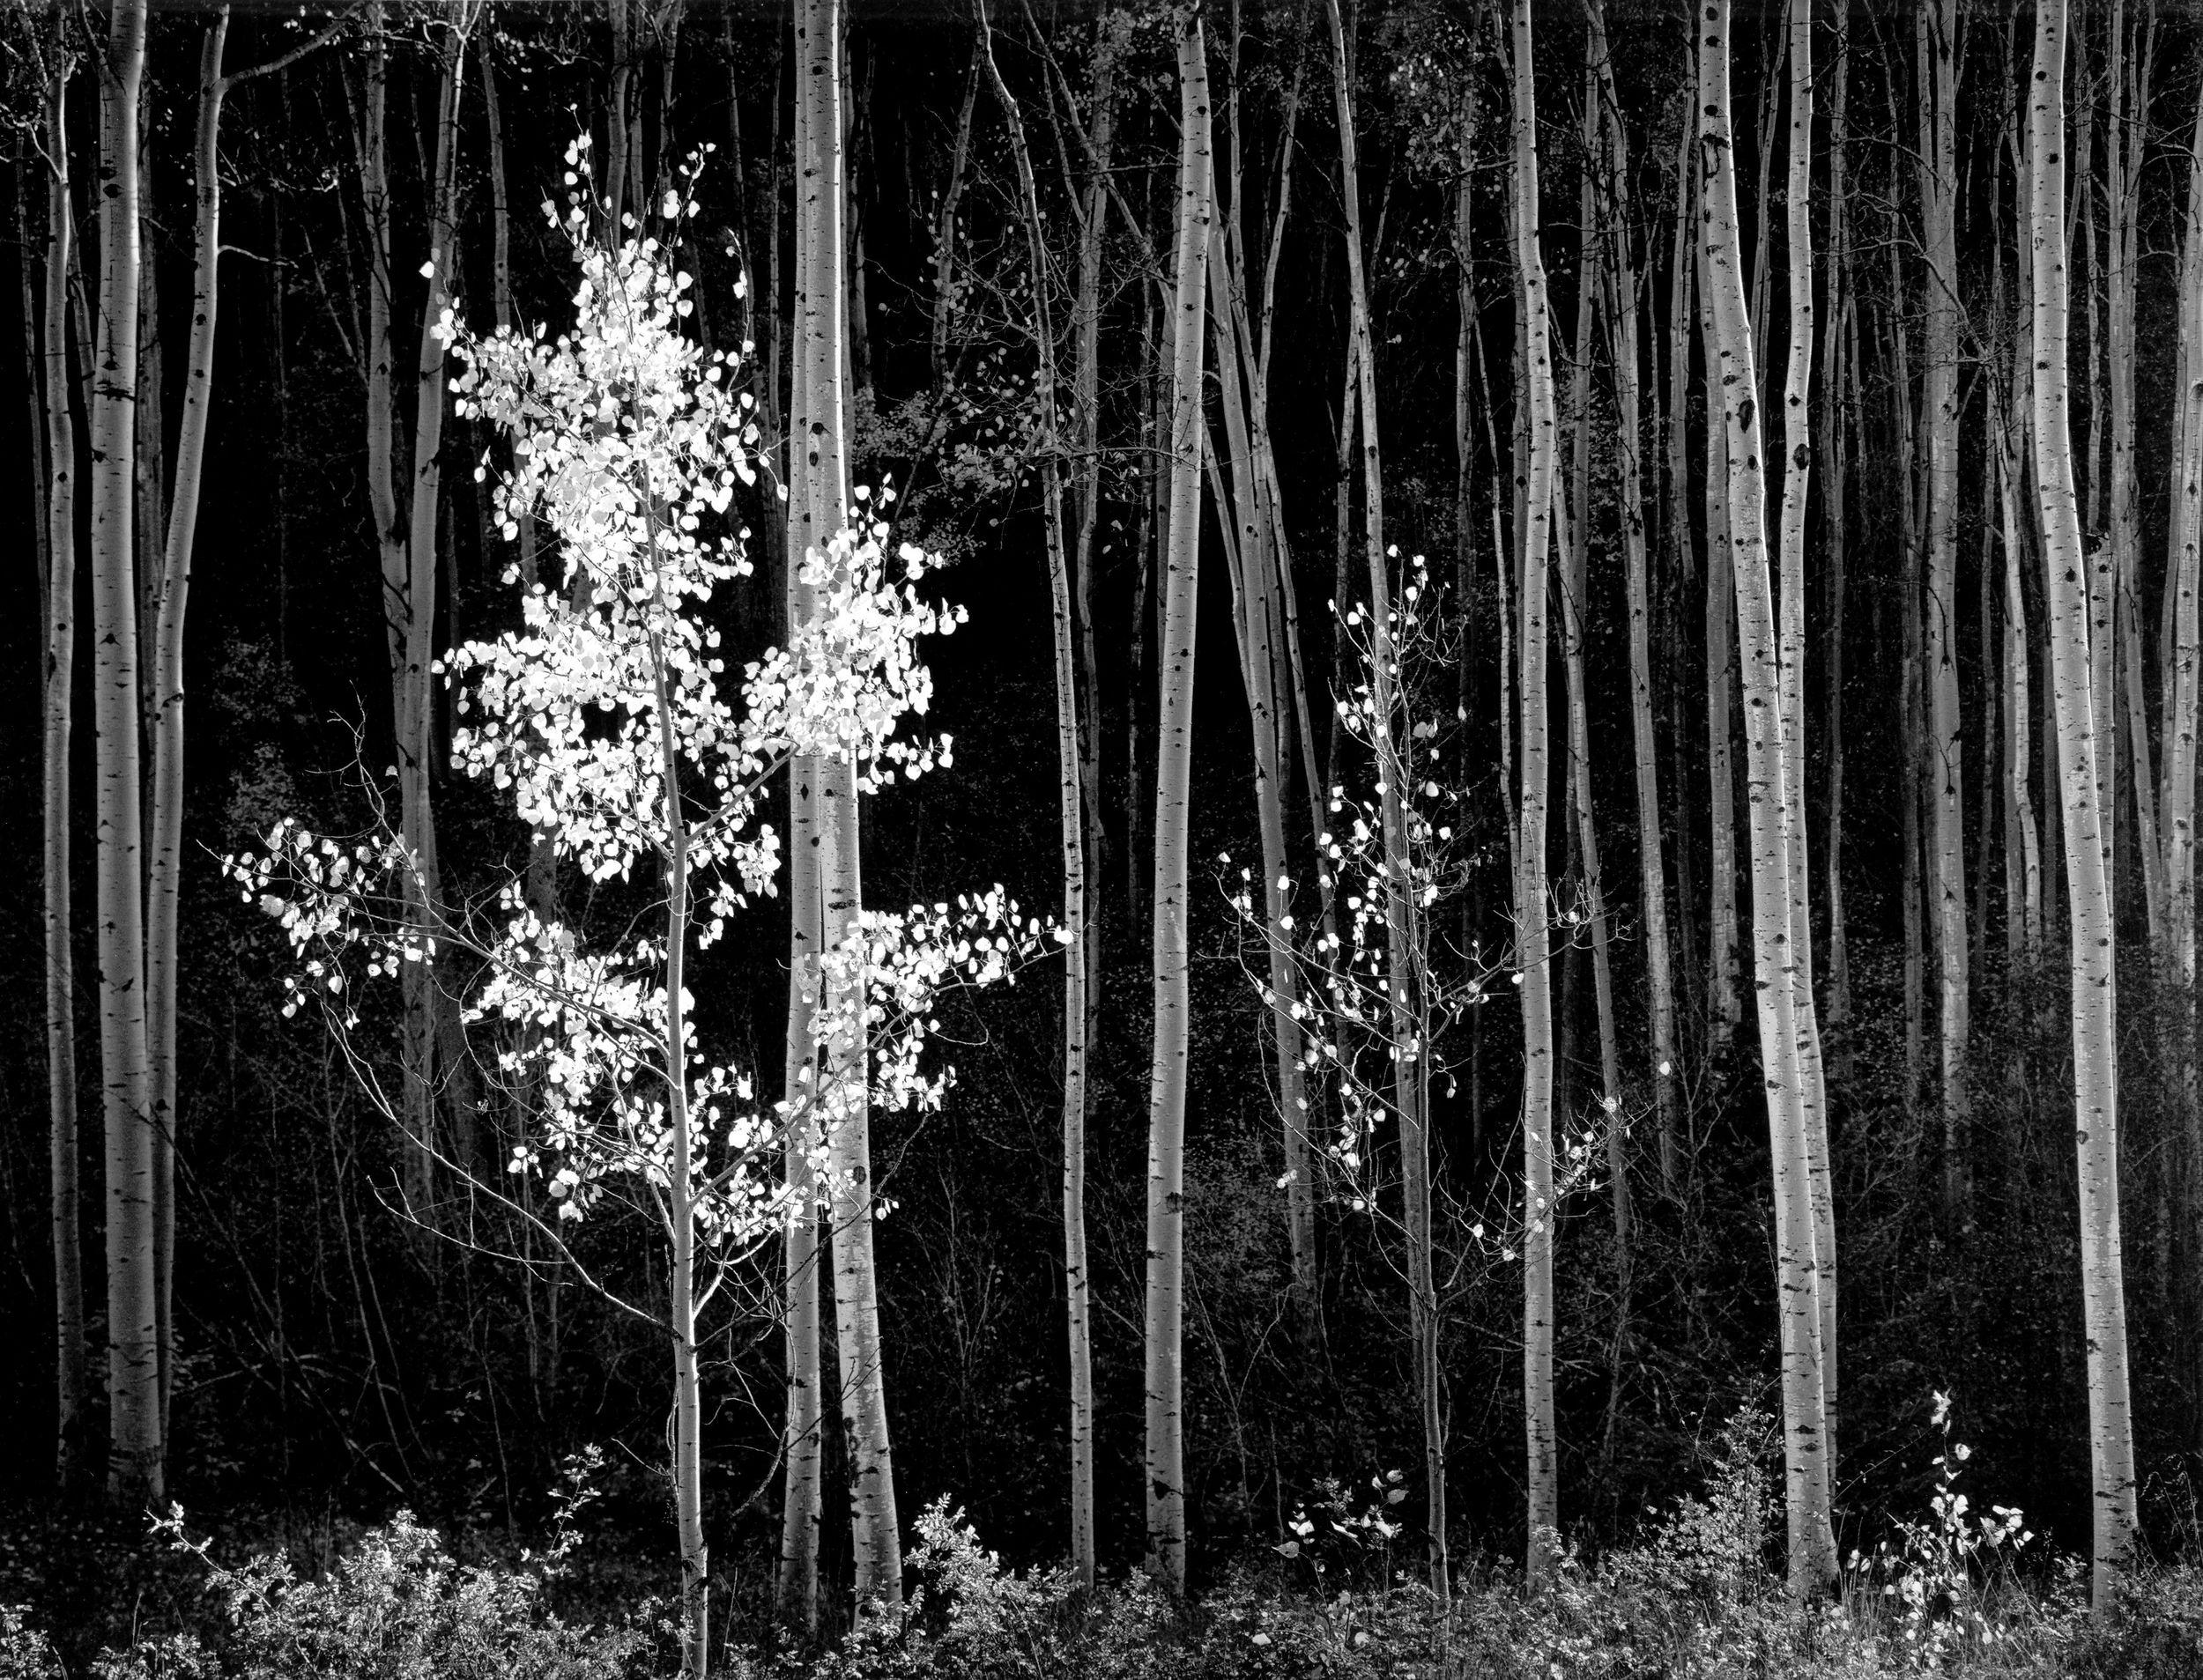 Aspens - Ansel Adams - New Mexico 1958